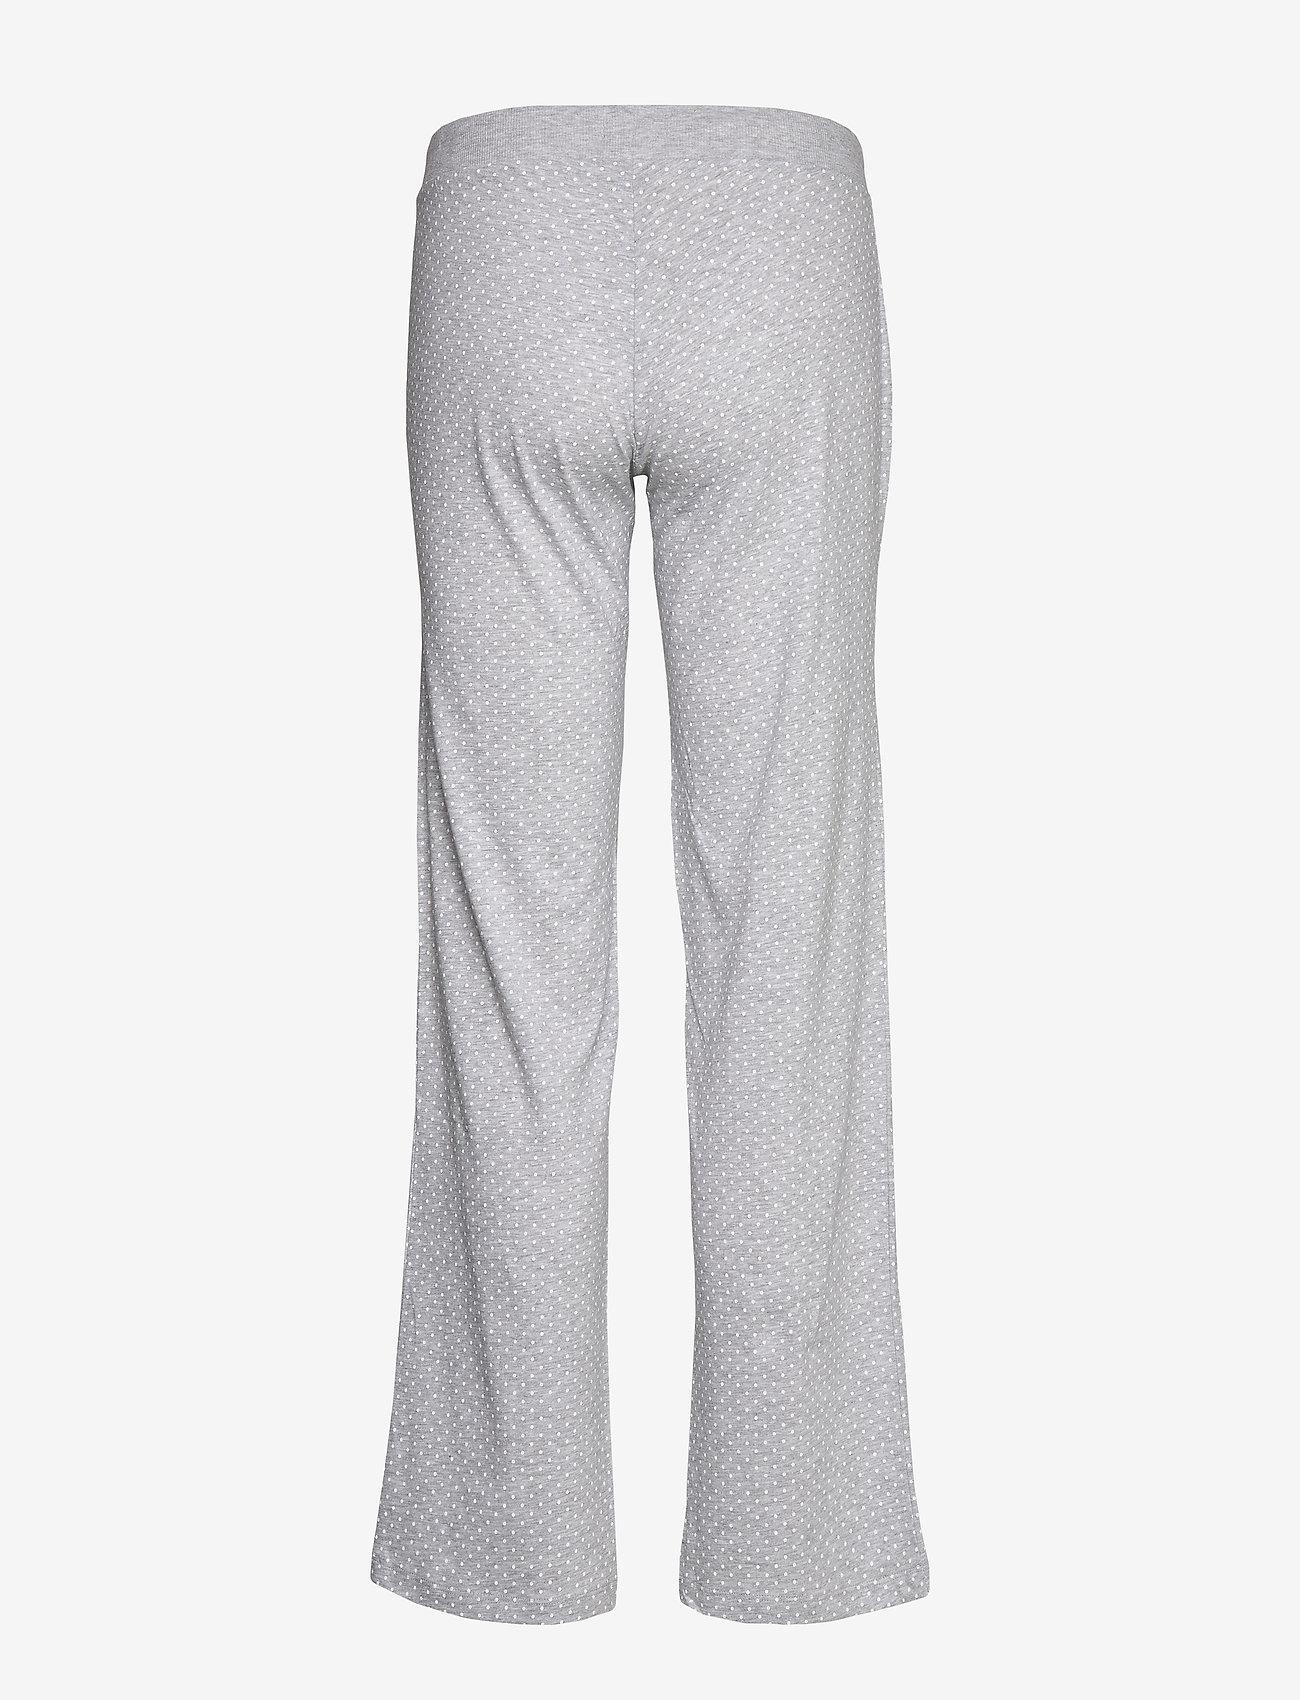 Esprit Bodywear Women - Nightpants - bottoms - light grey - 1